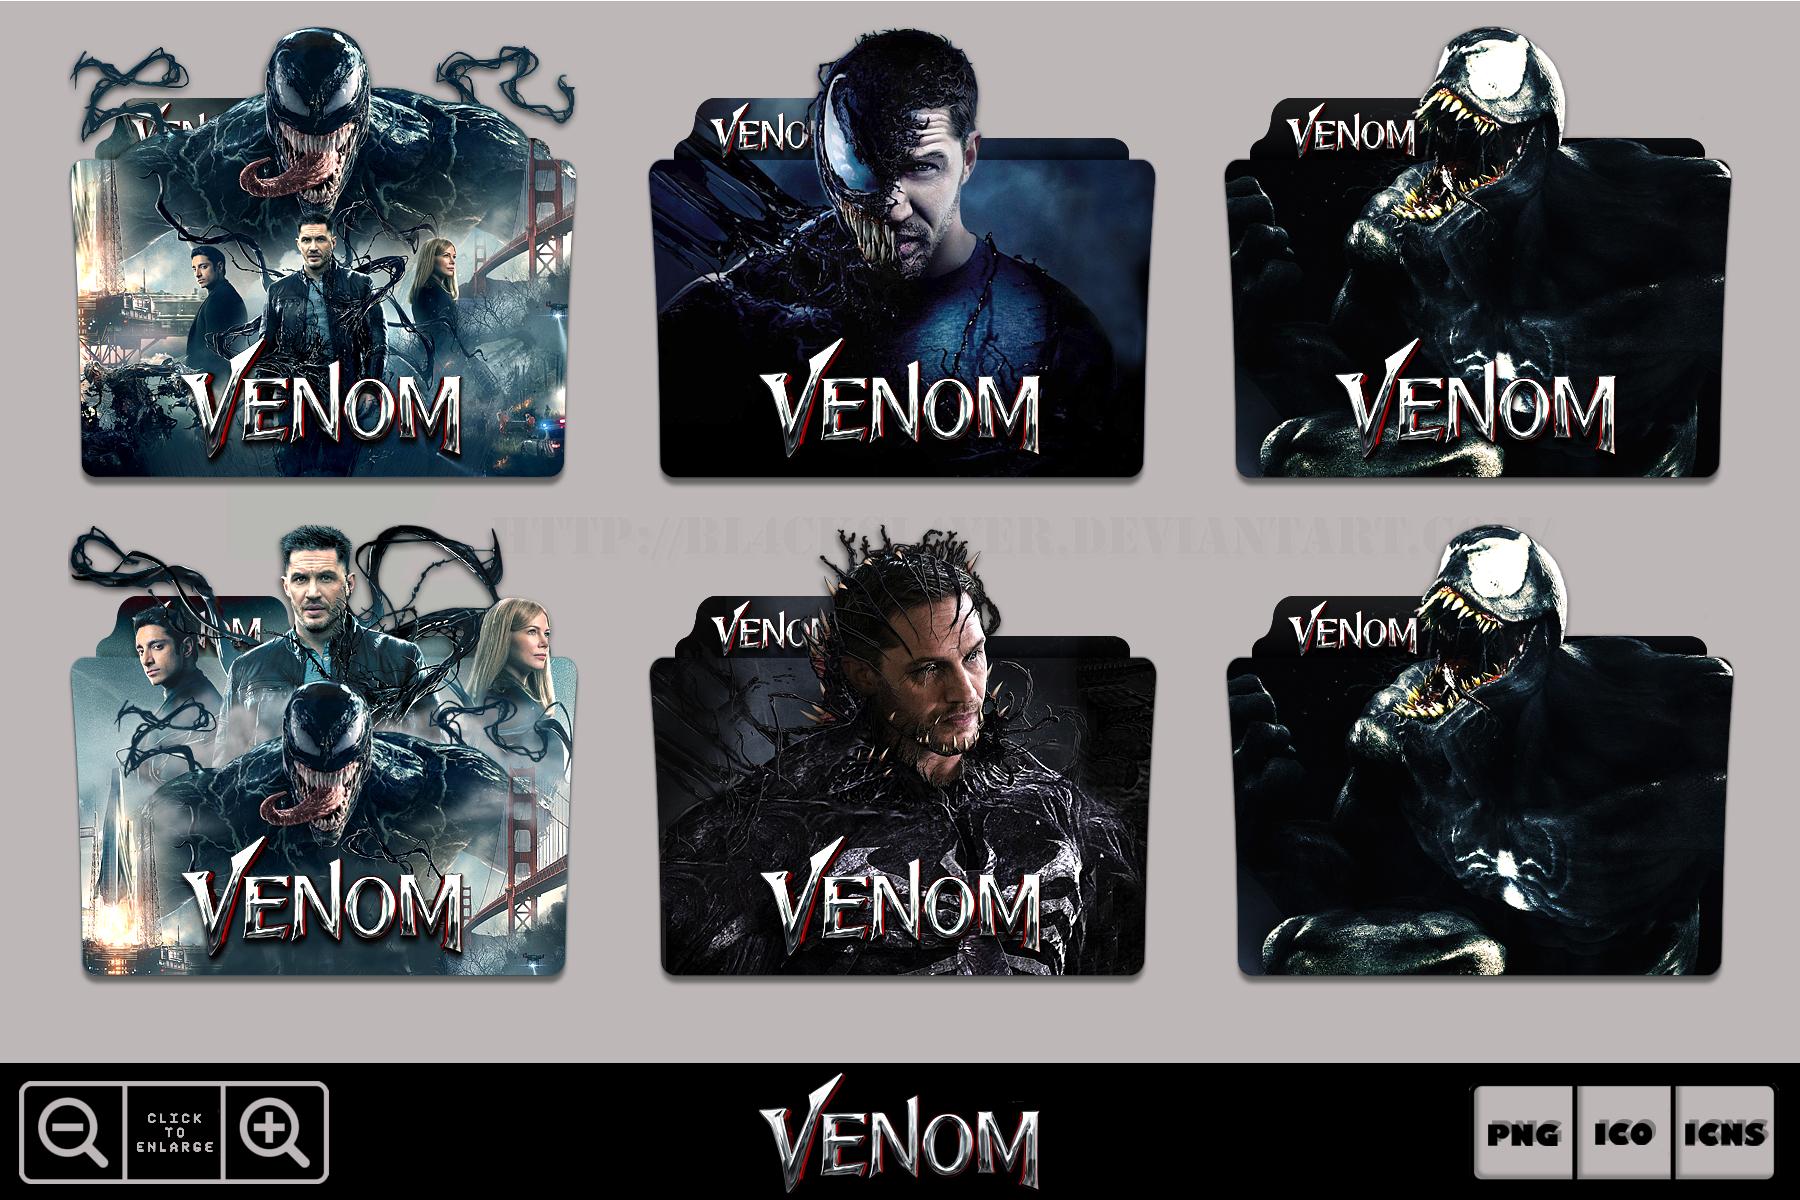 Venom (2018) Folder Icon Pack by Bl4CKSL4YER on DeviantArt